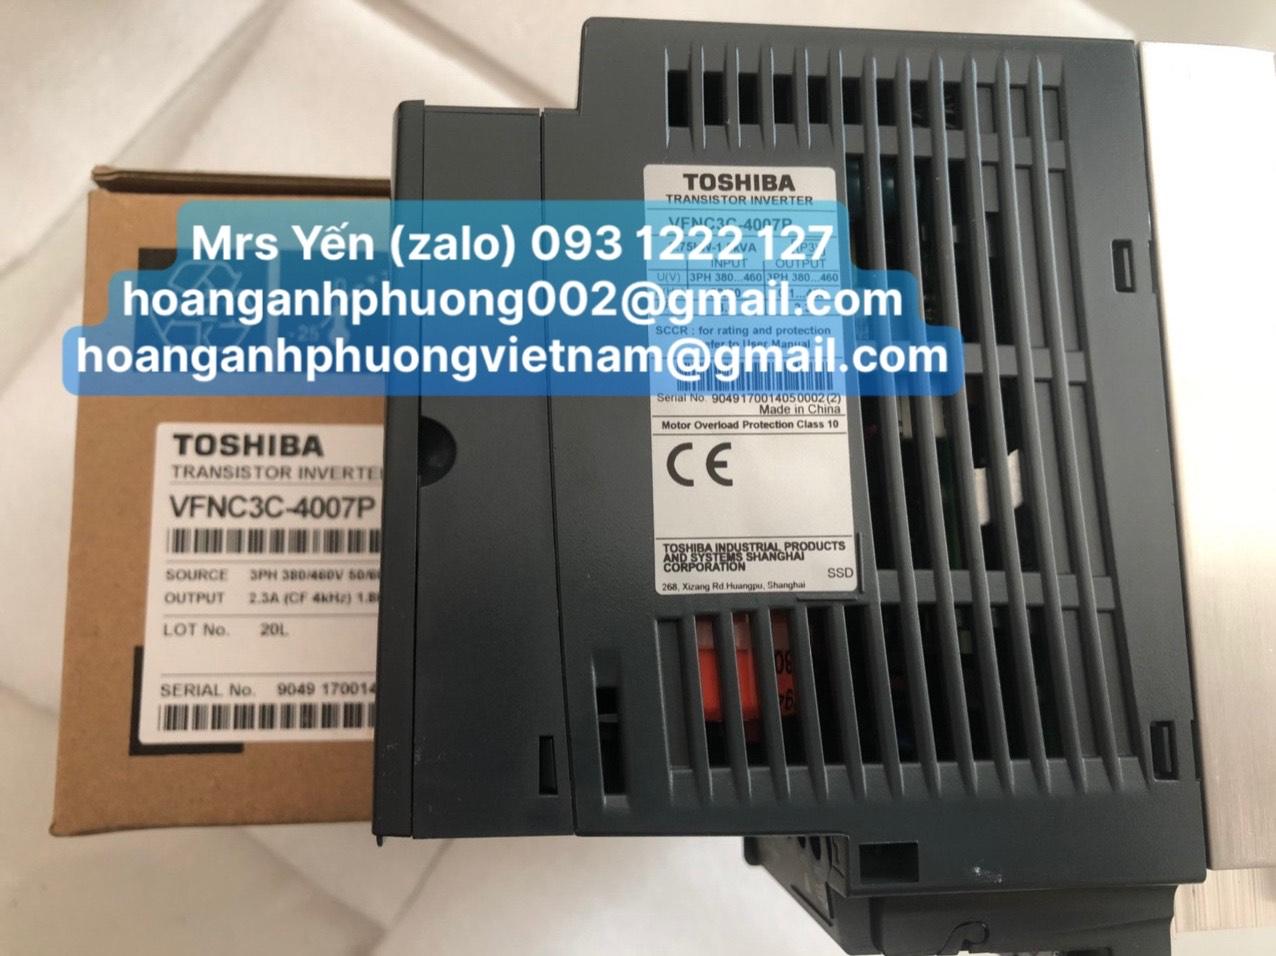 VFNC3C-4007P_Inverter Toshiba